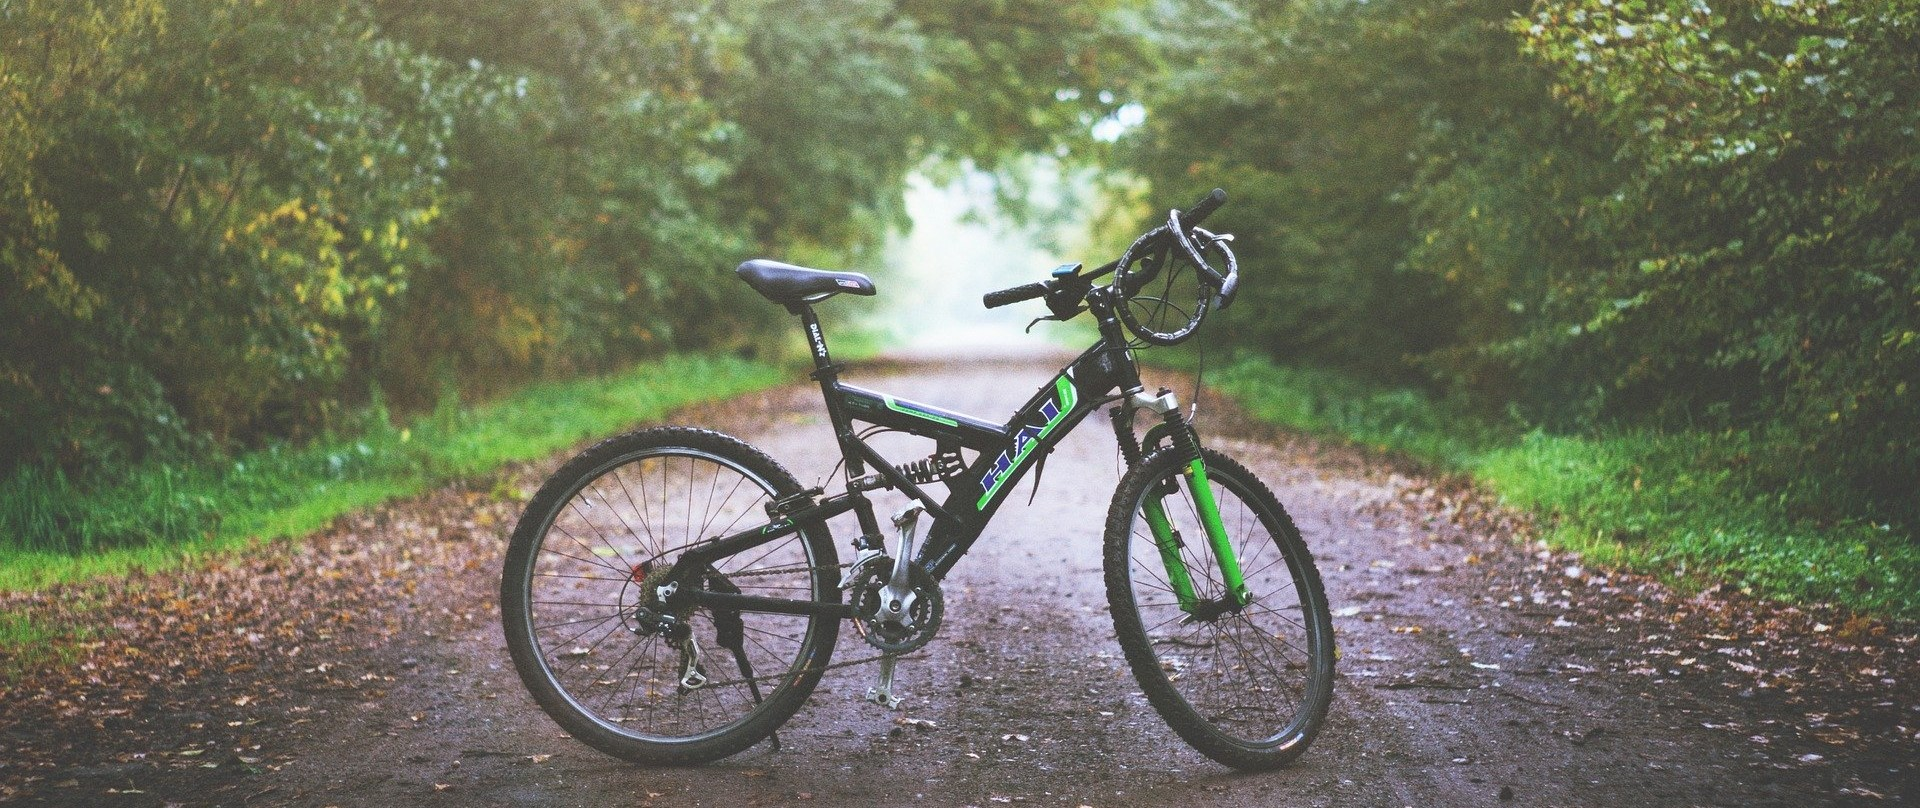 mountain bike 1149074 1920